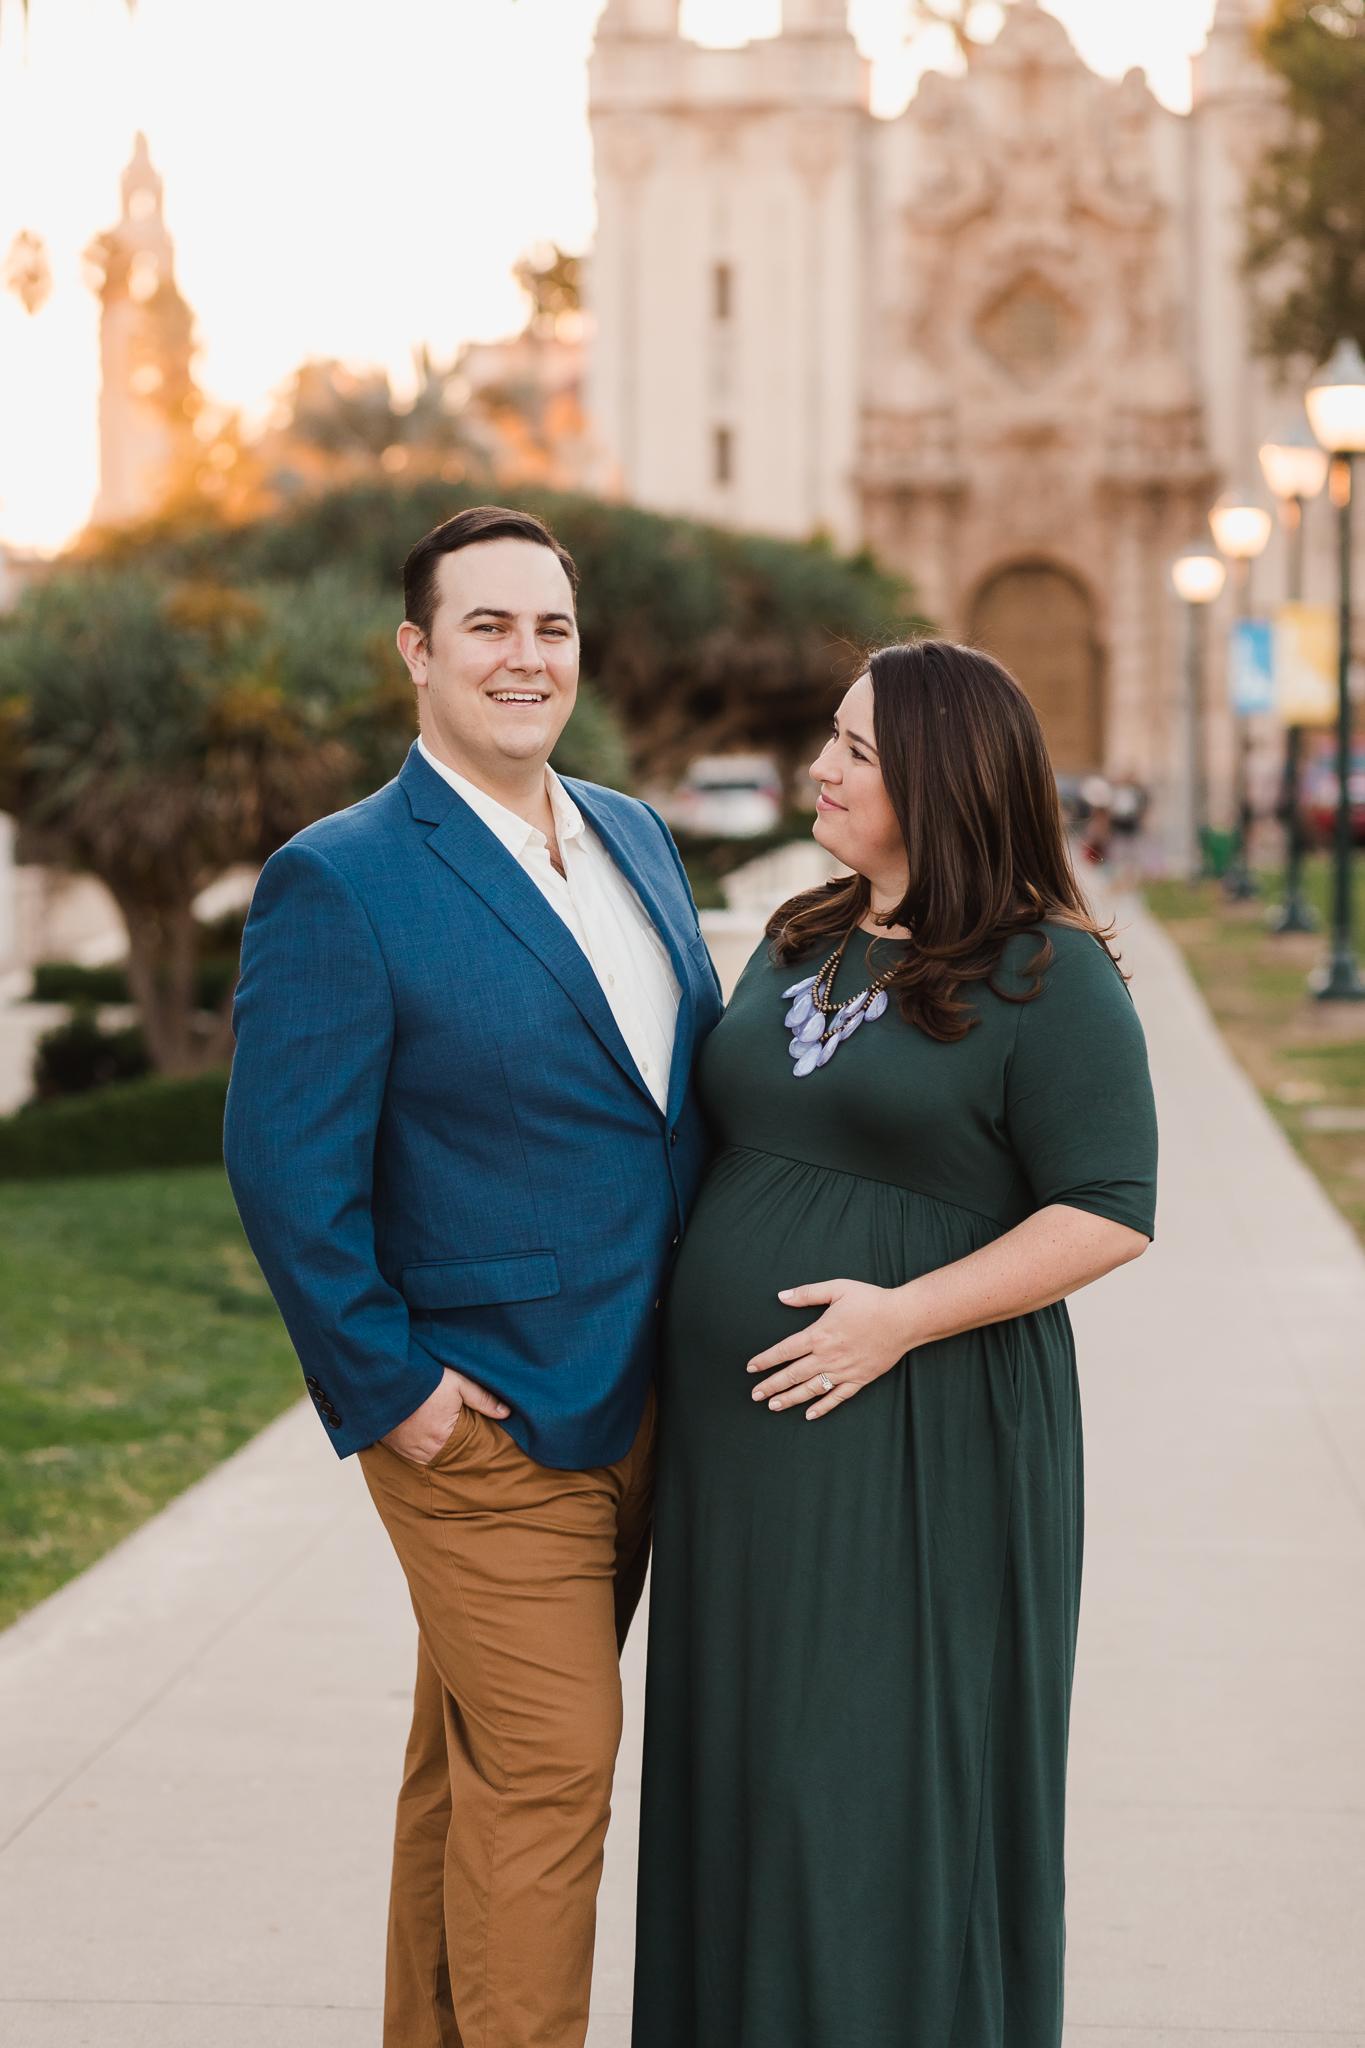 Maternity Photos at Balboa Park